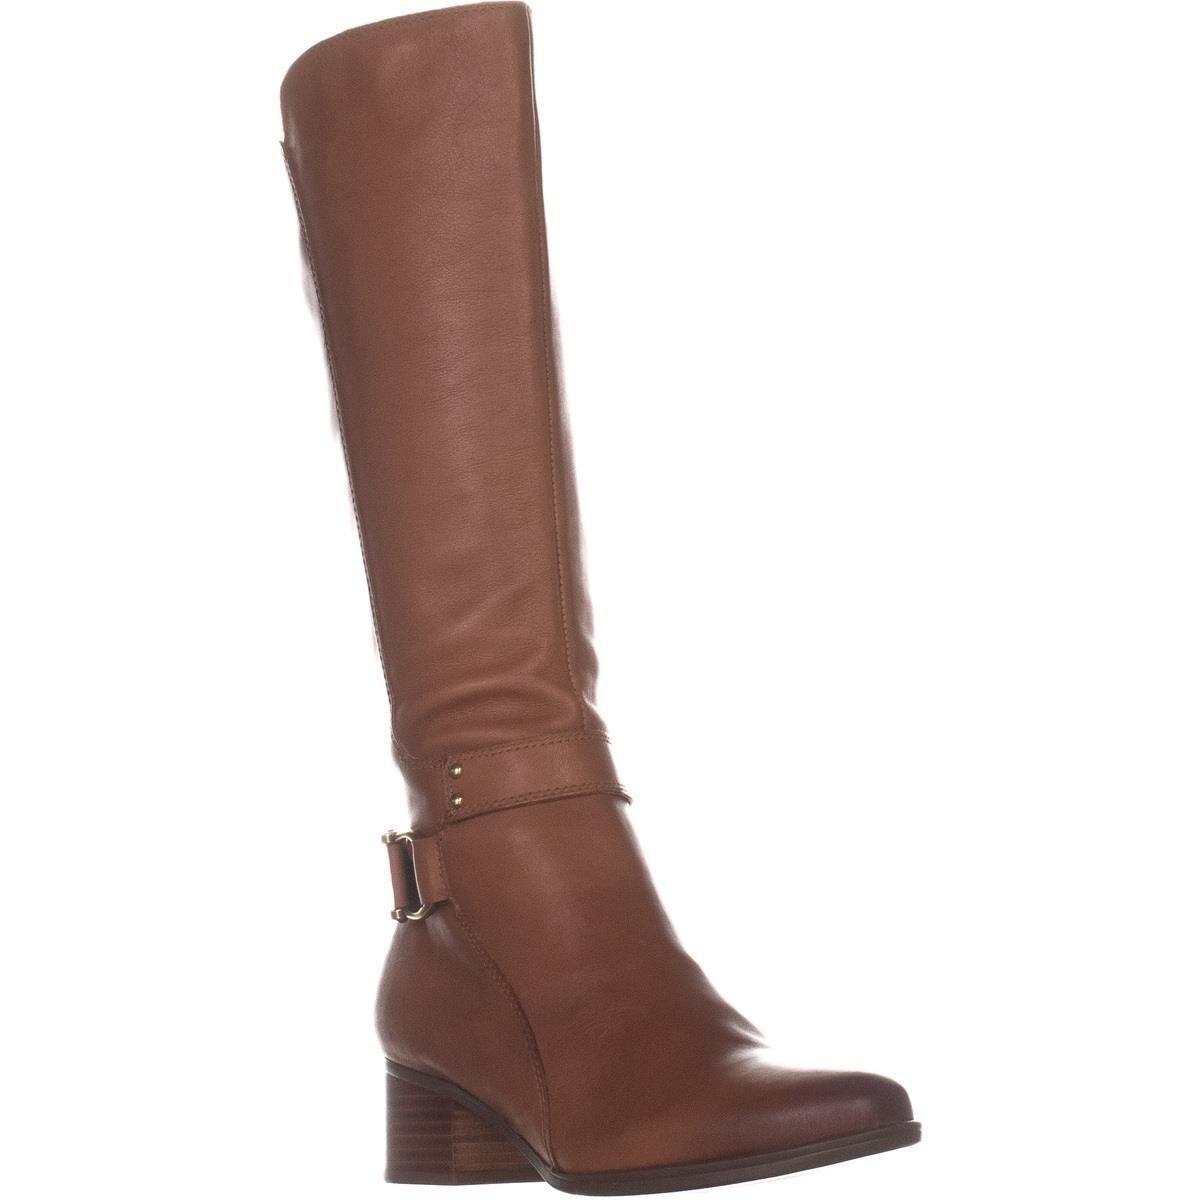 4860071cff08 Shop naturalizer Dane Knee High Boots